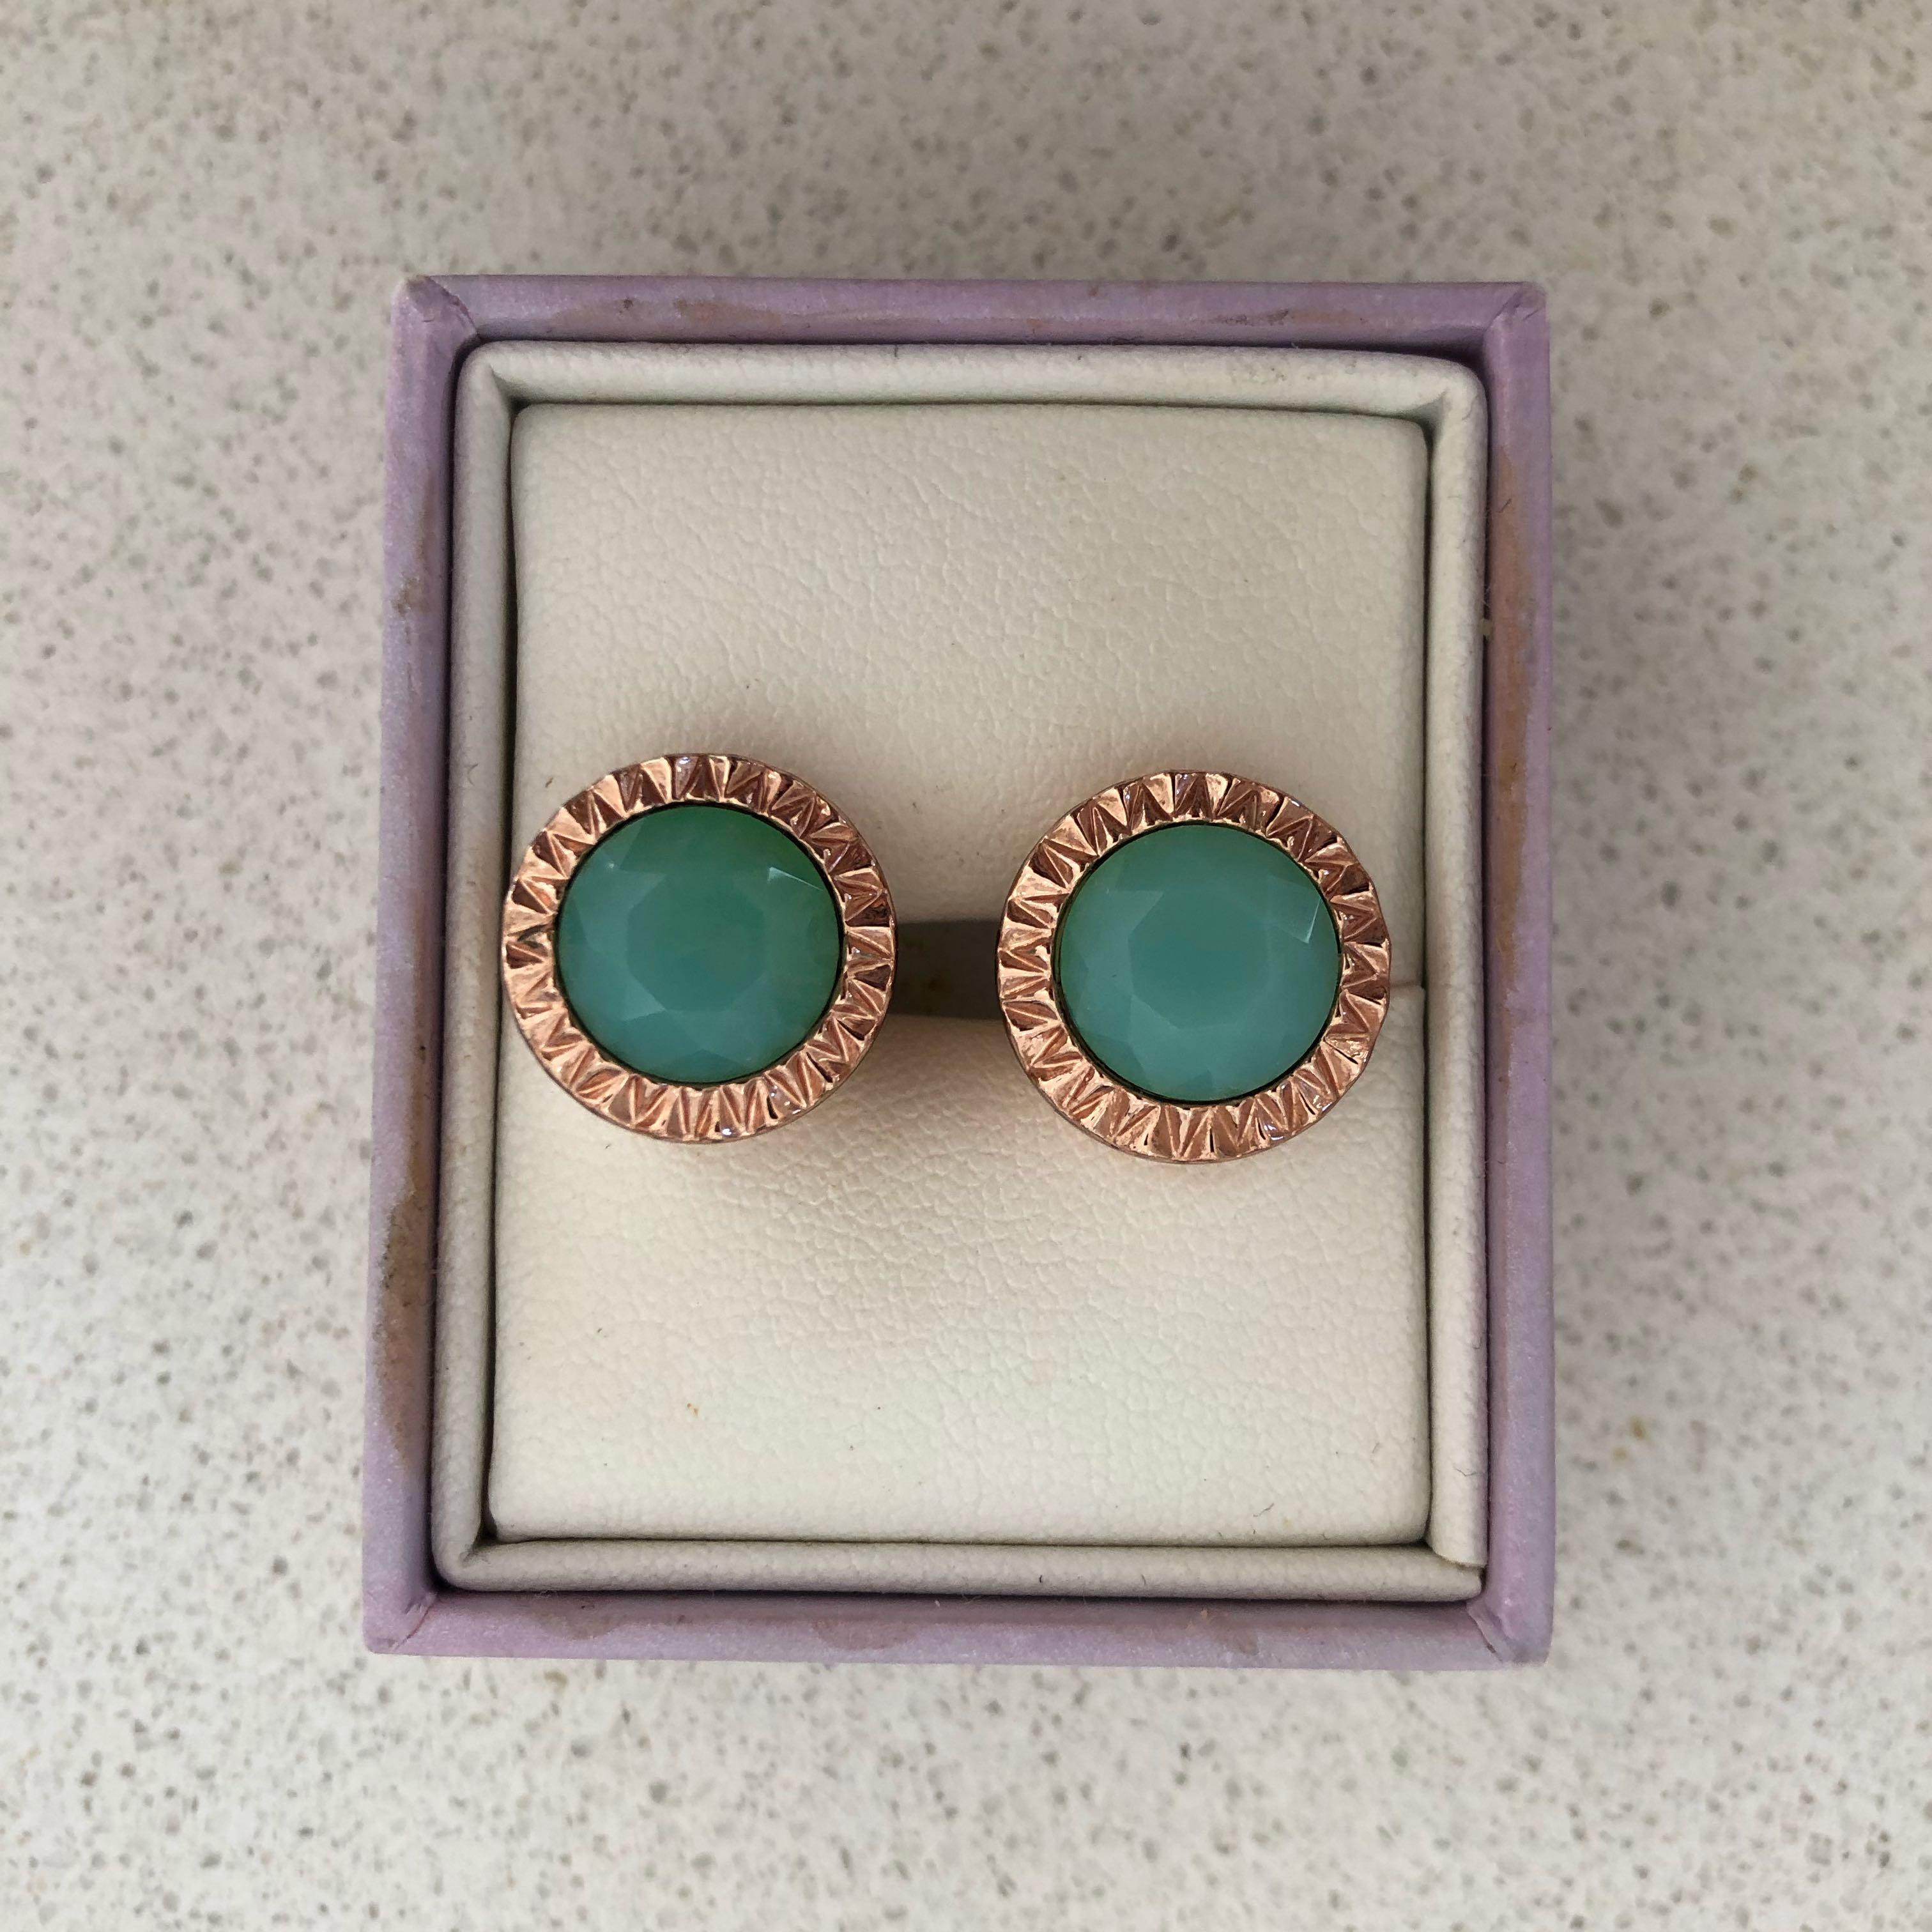 Mimco crystal earrings